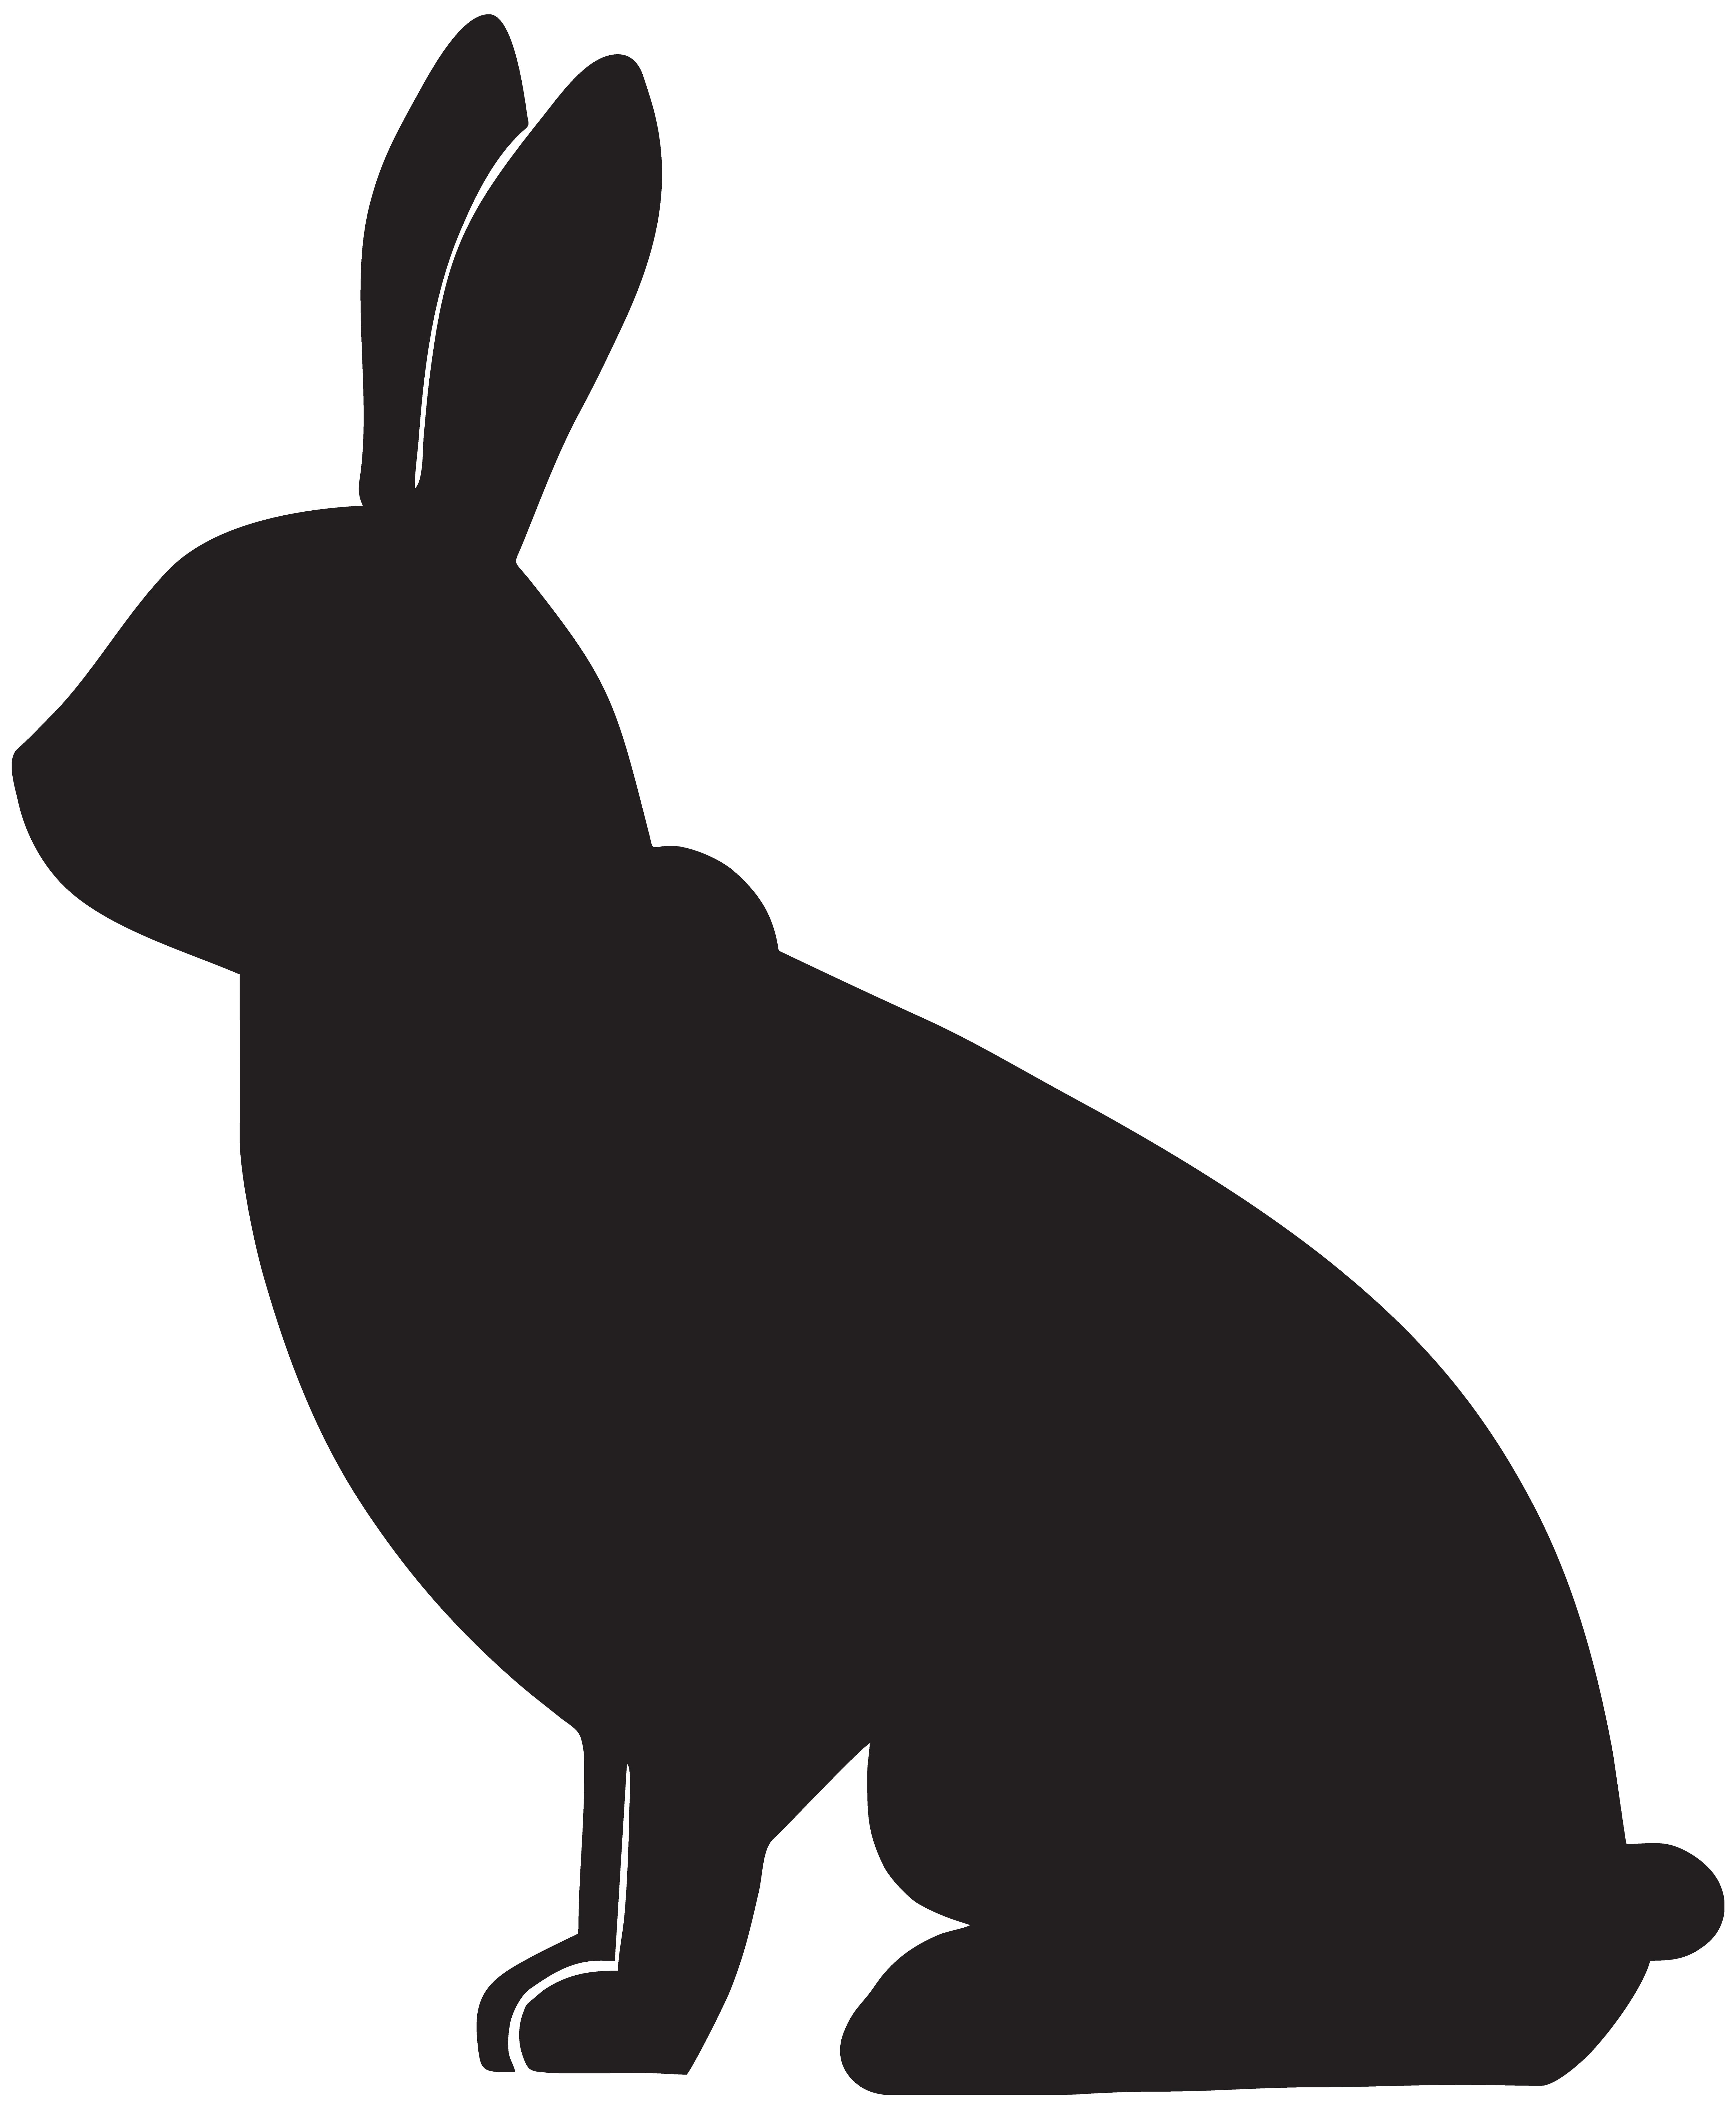 Rabbit Silhouette PNG Clip Art Image.